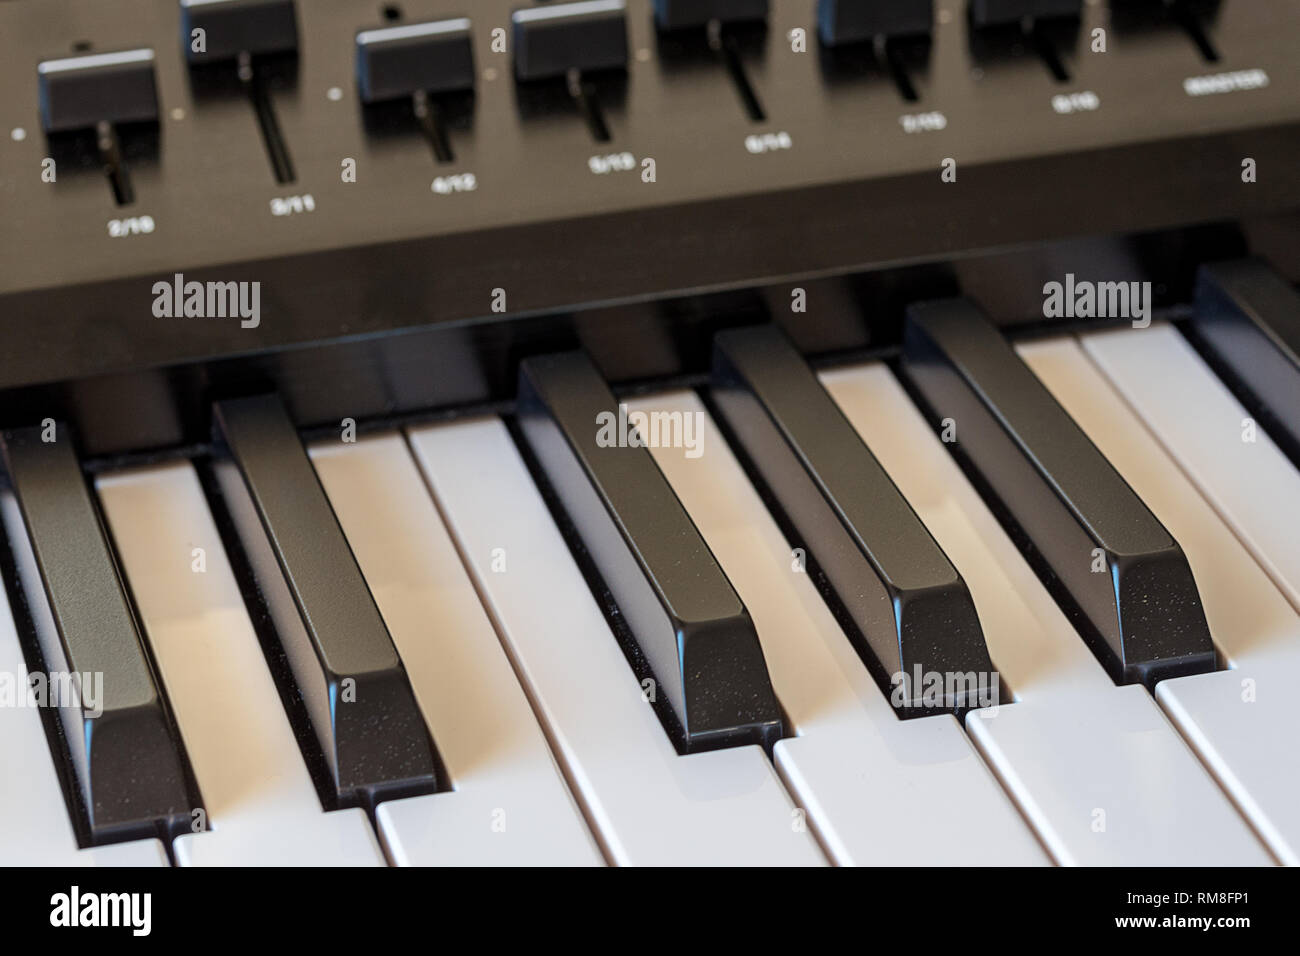 Midi keyboard synthesizer piano keys closeup for electronic music production - Stock Image